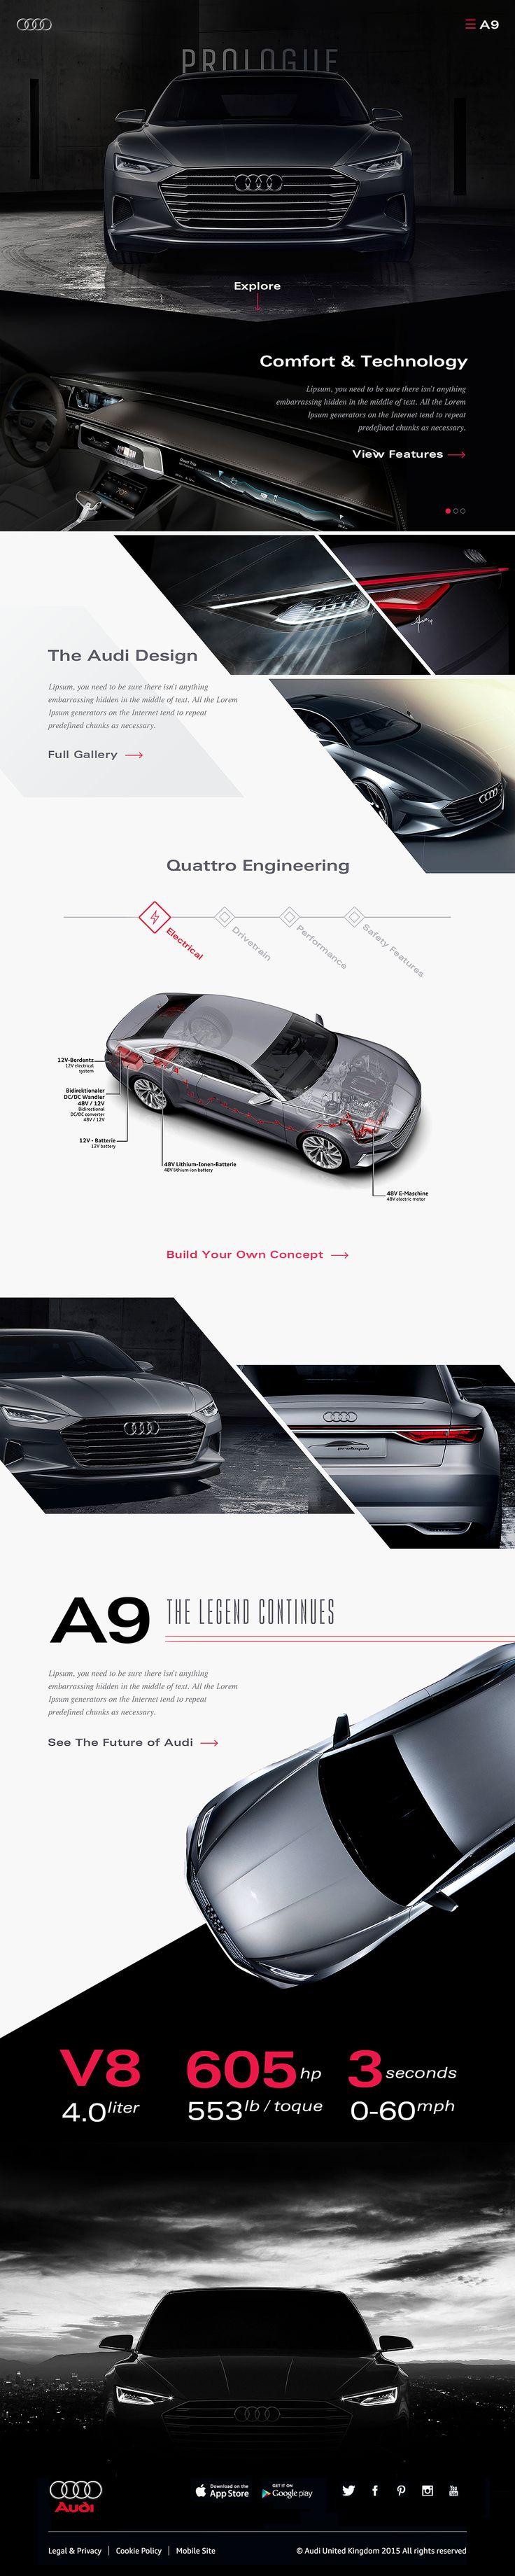 Audi prologue 1200